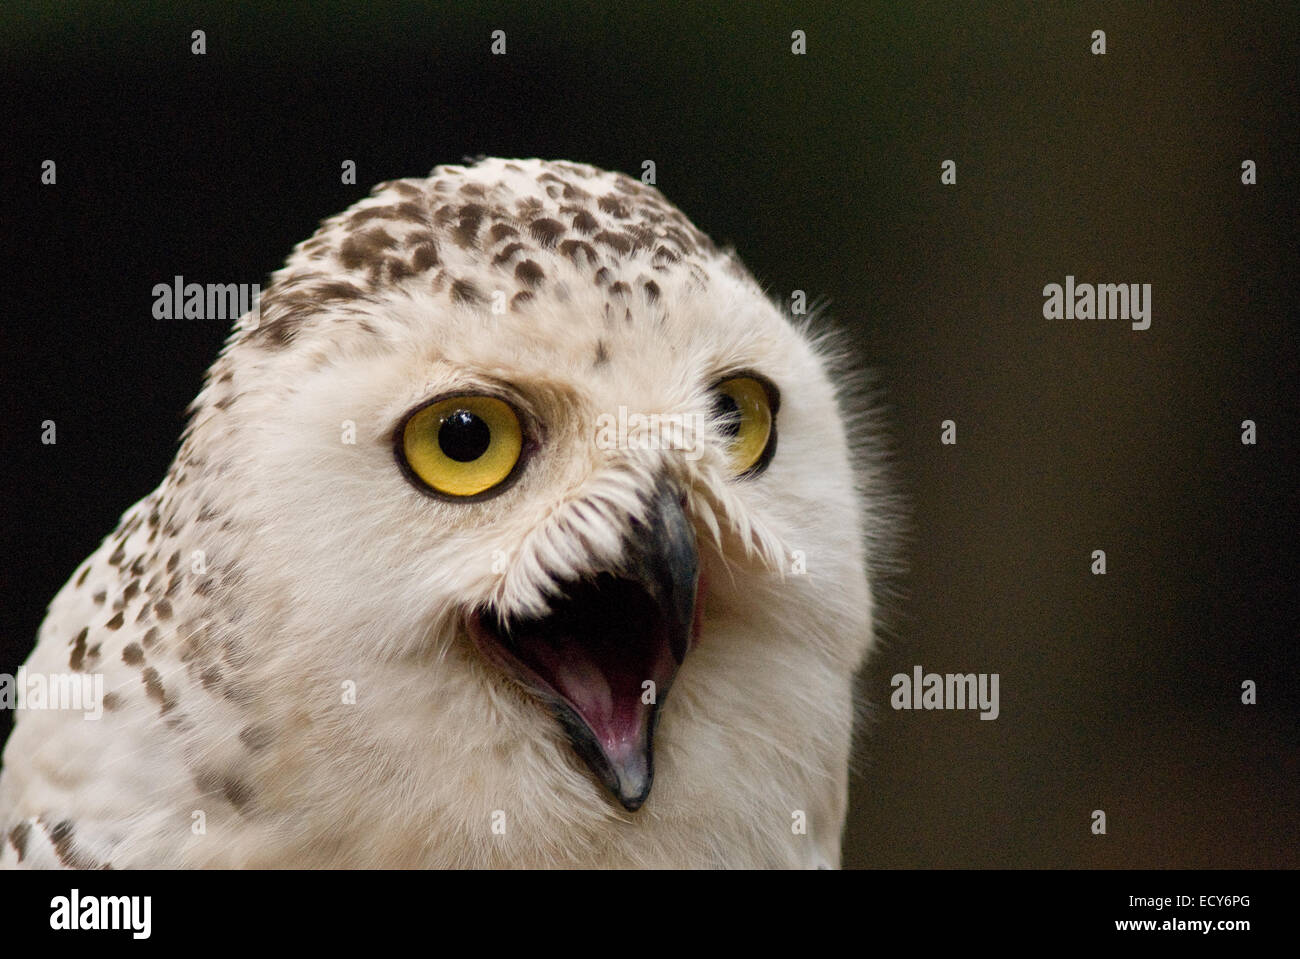 Snowy Owl, Bubo scandiacus, Strigidae - Stock Image